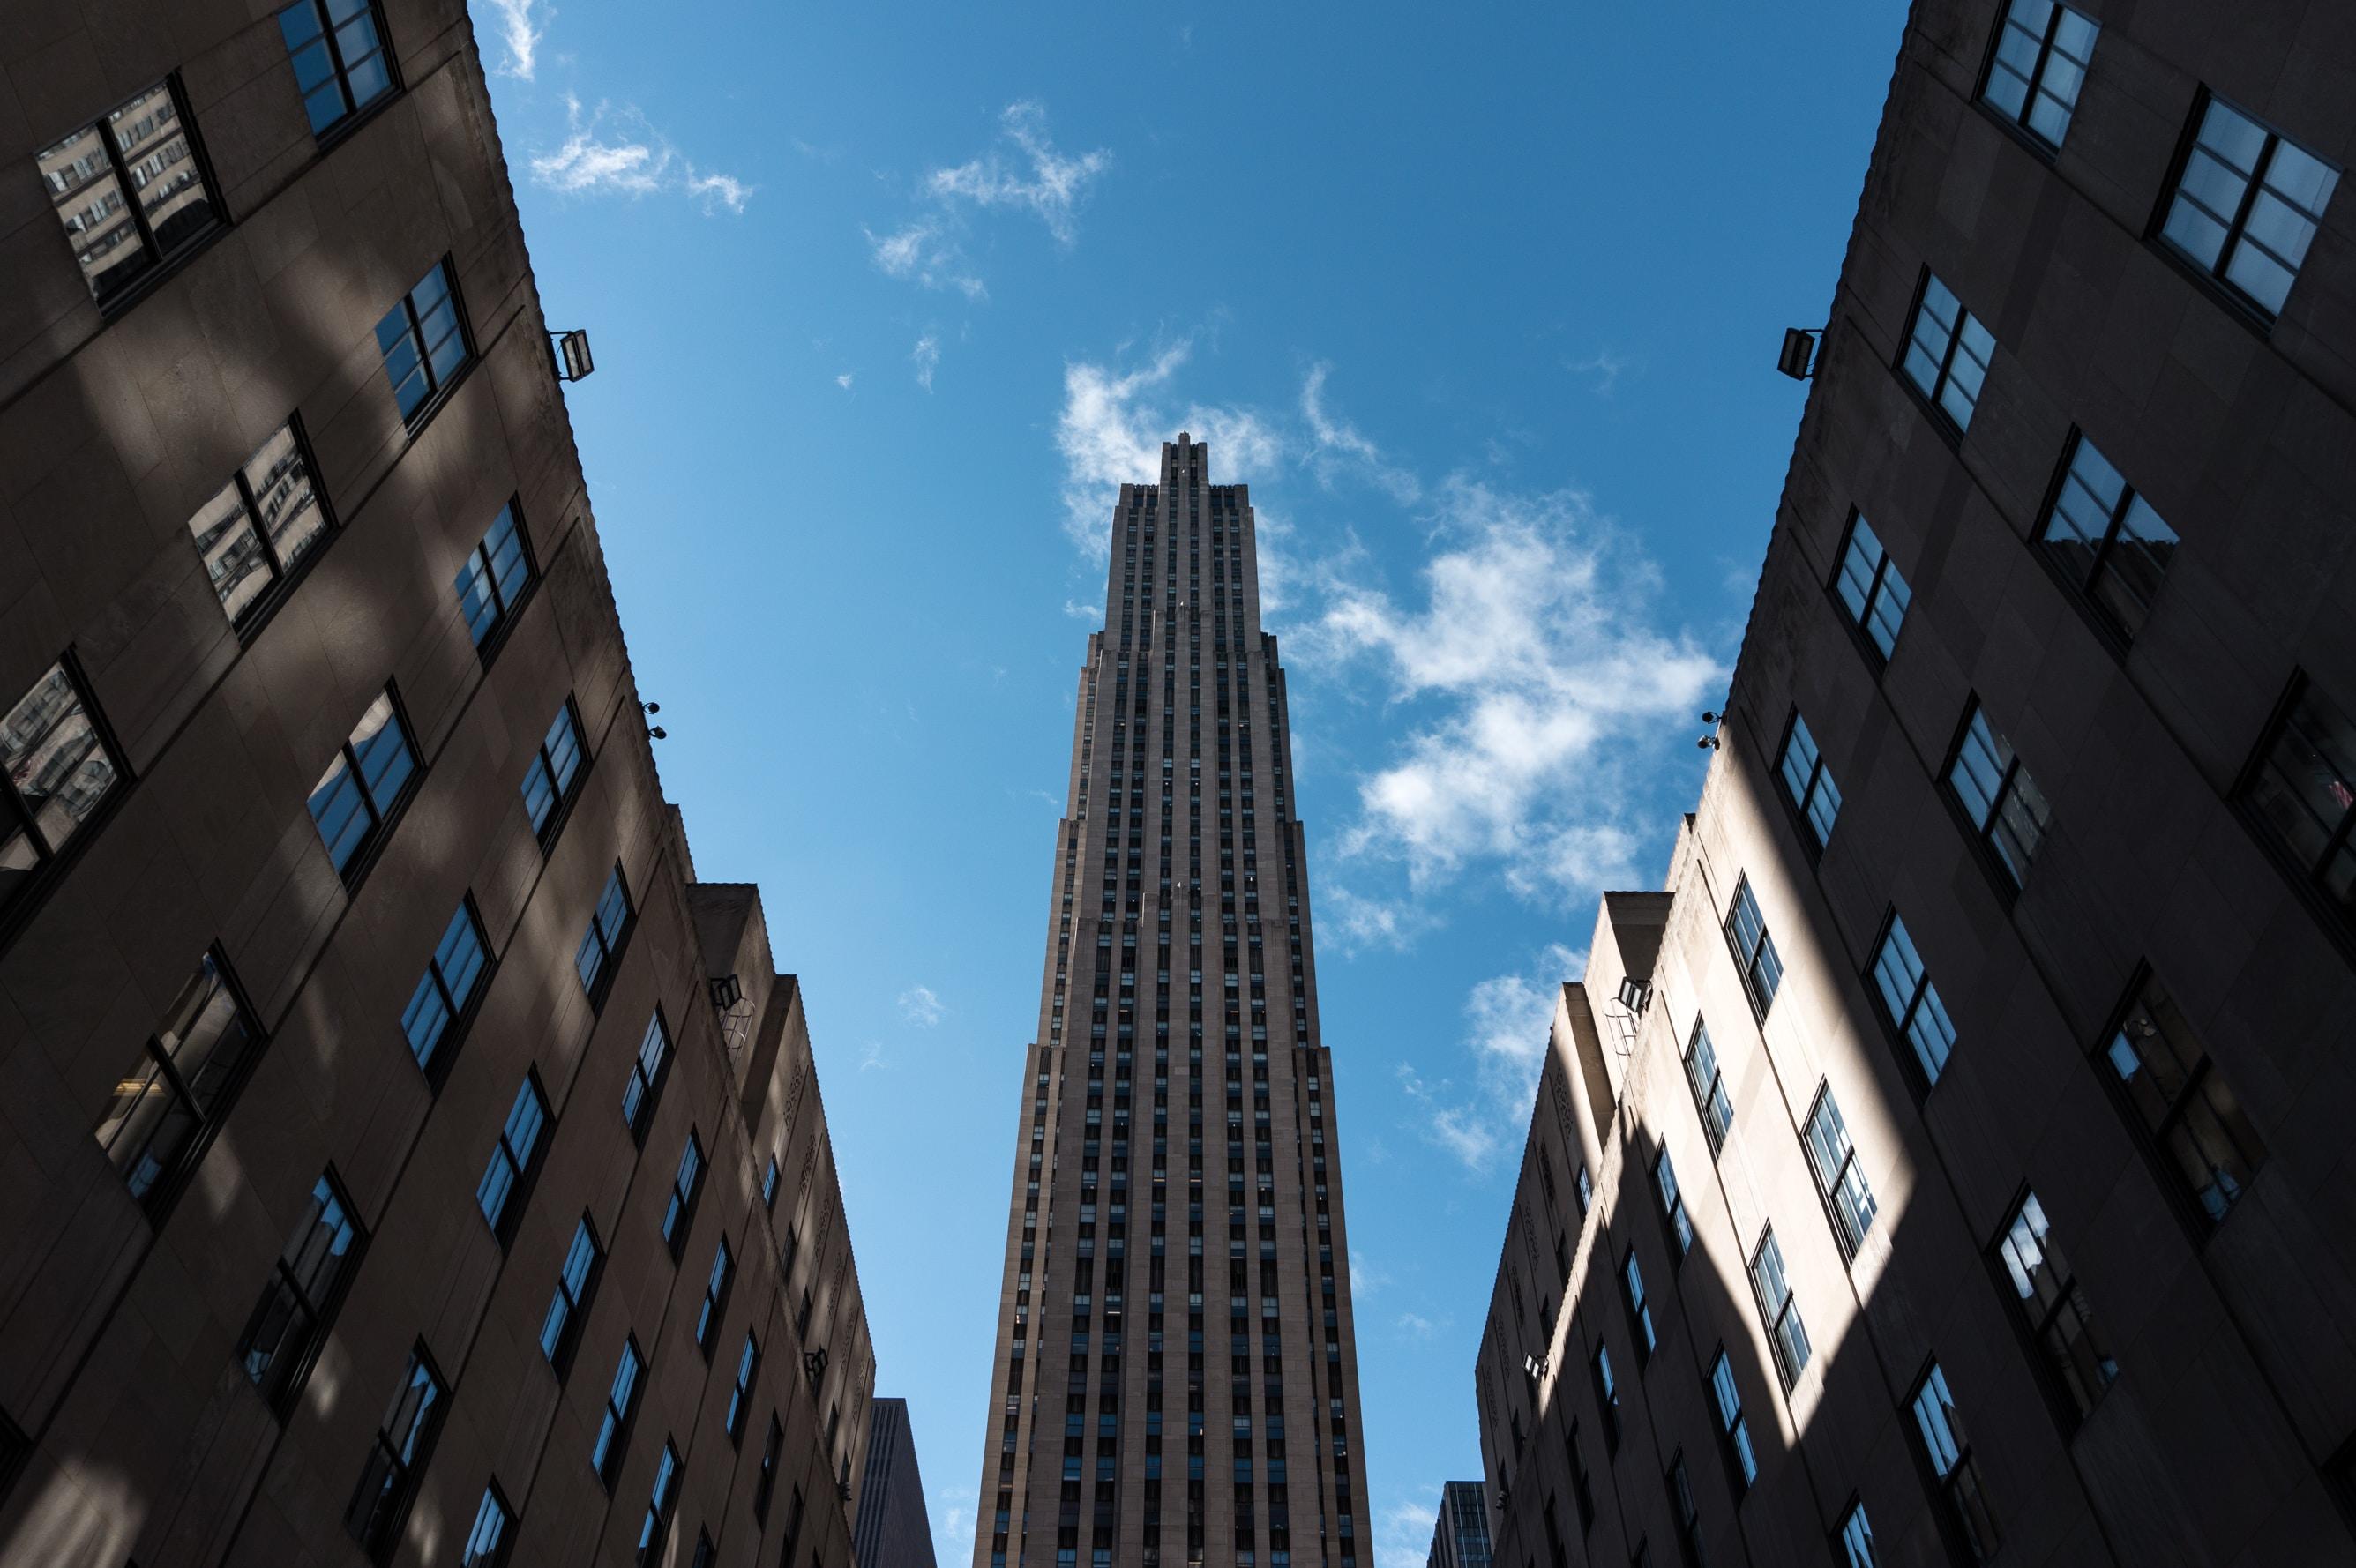 architectural photography of skyscraper